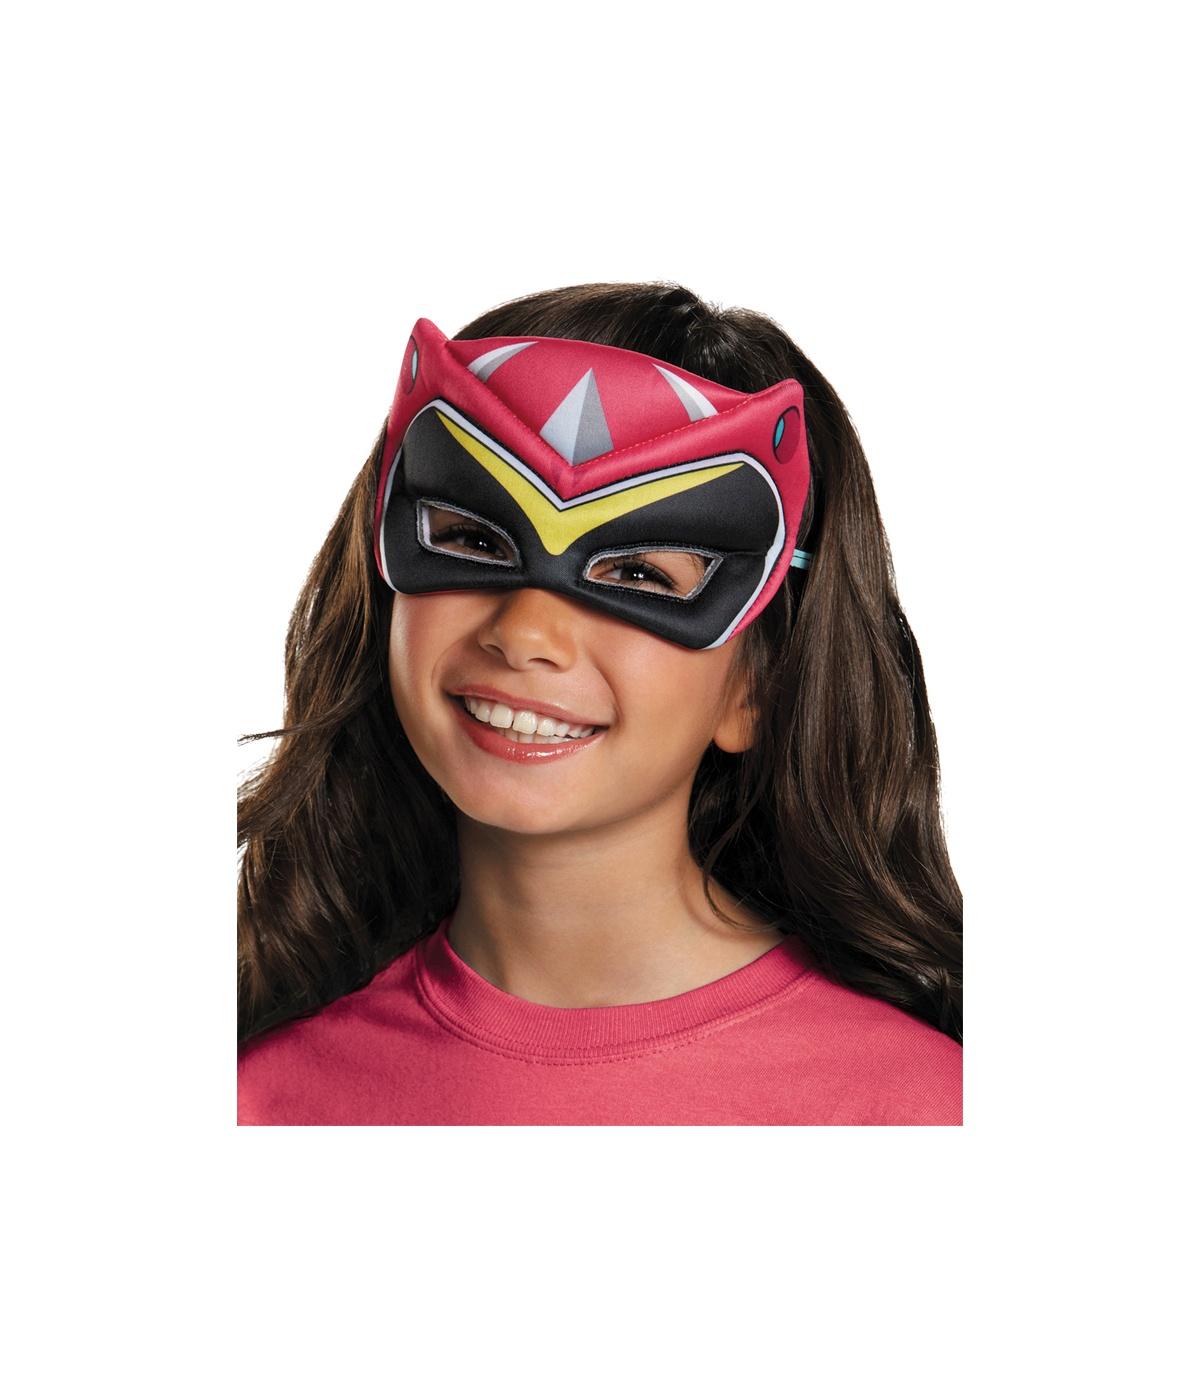 Pink Power Ranger Dino Charge Piger Puffy Mask - Masker-3340